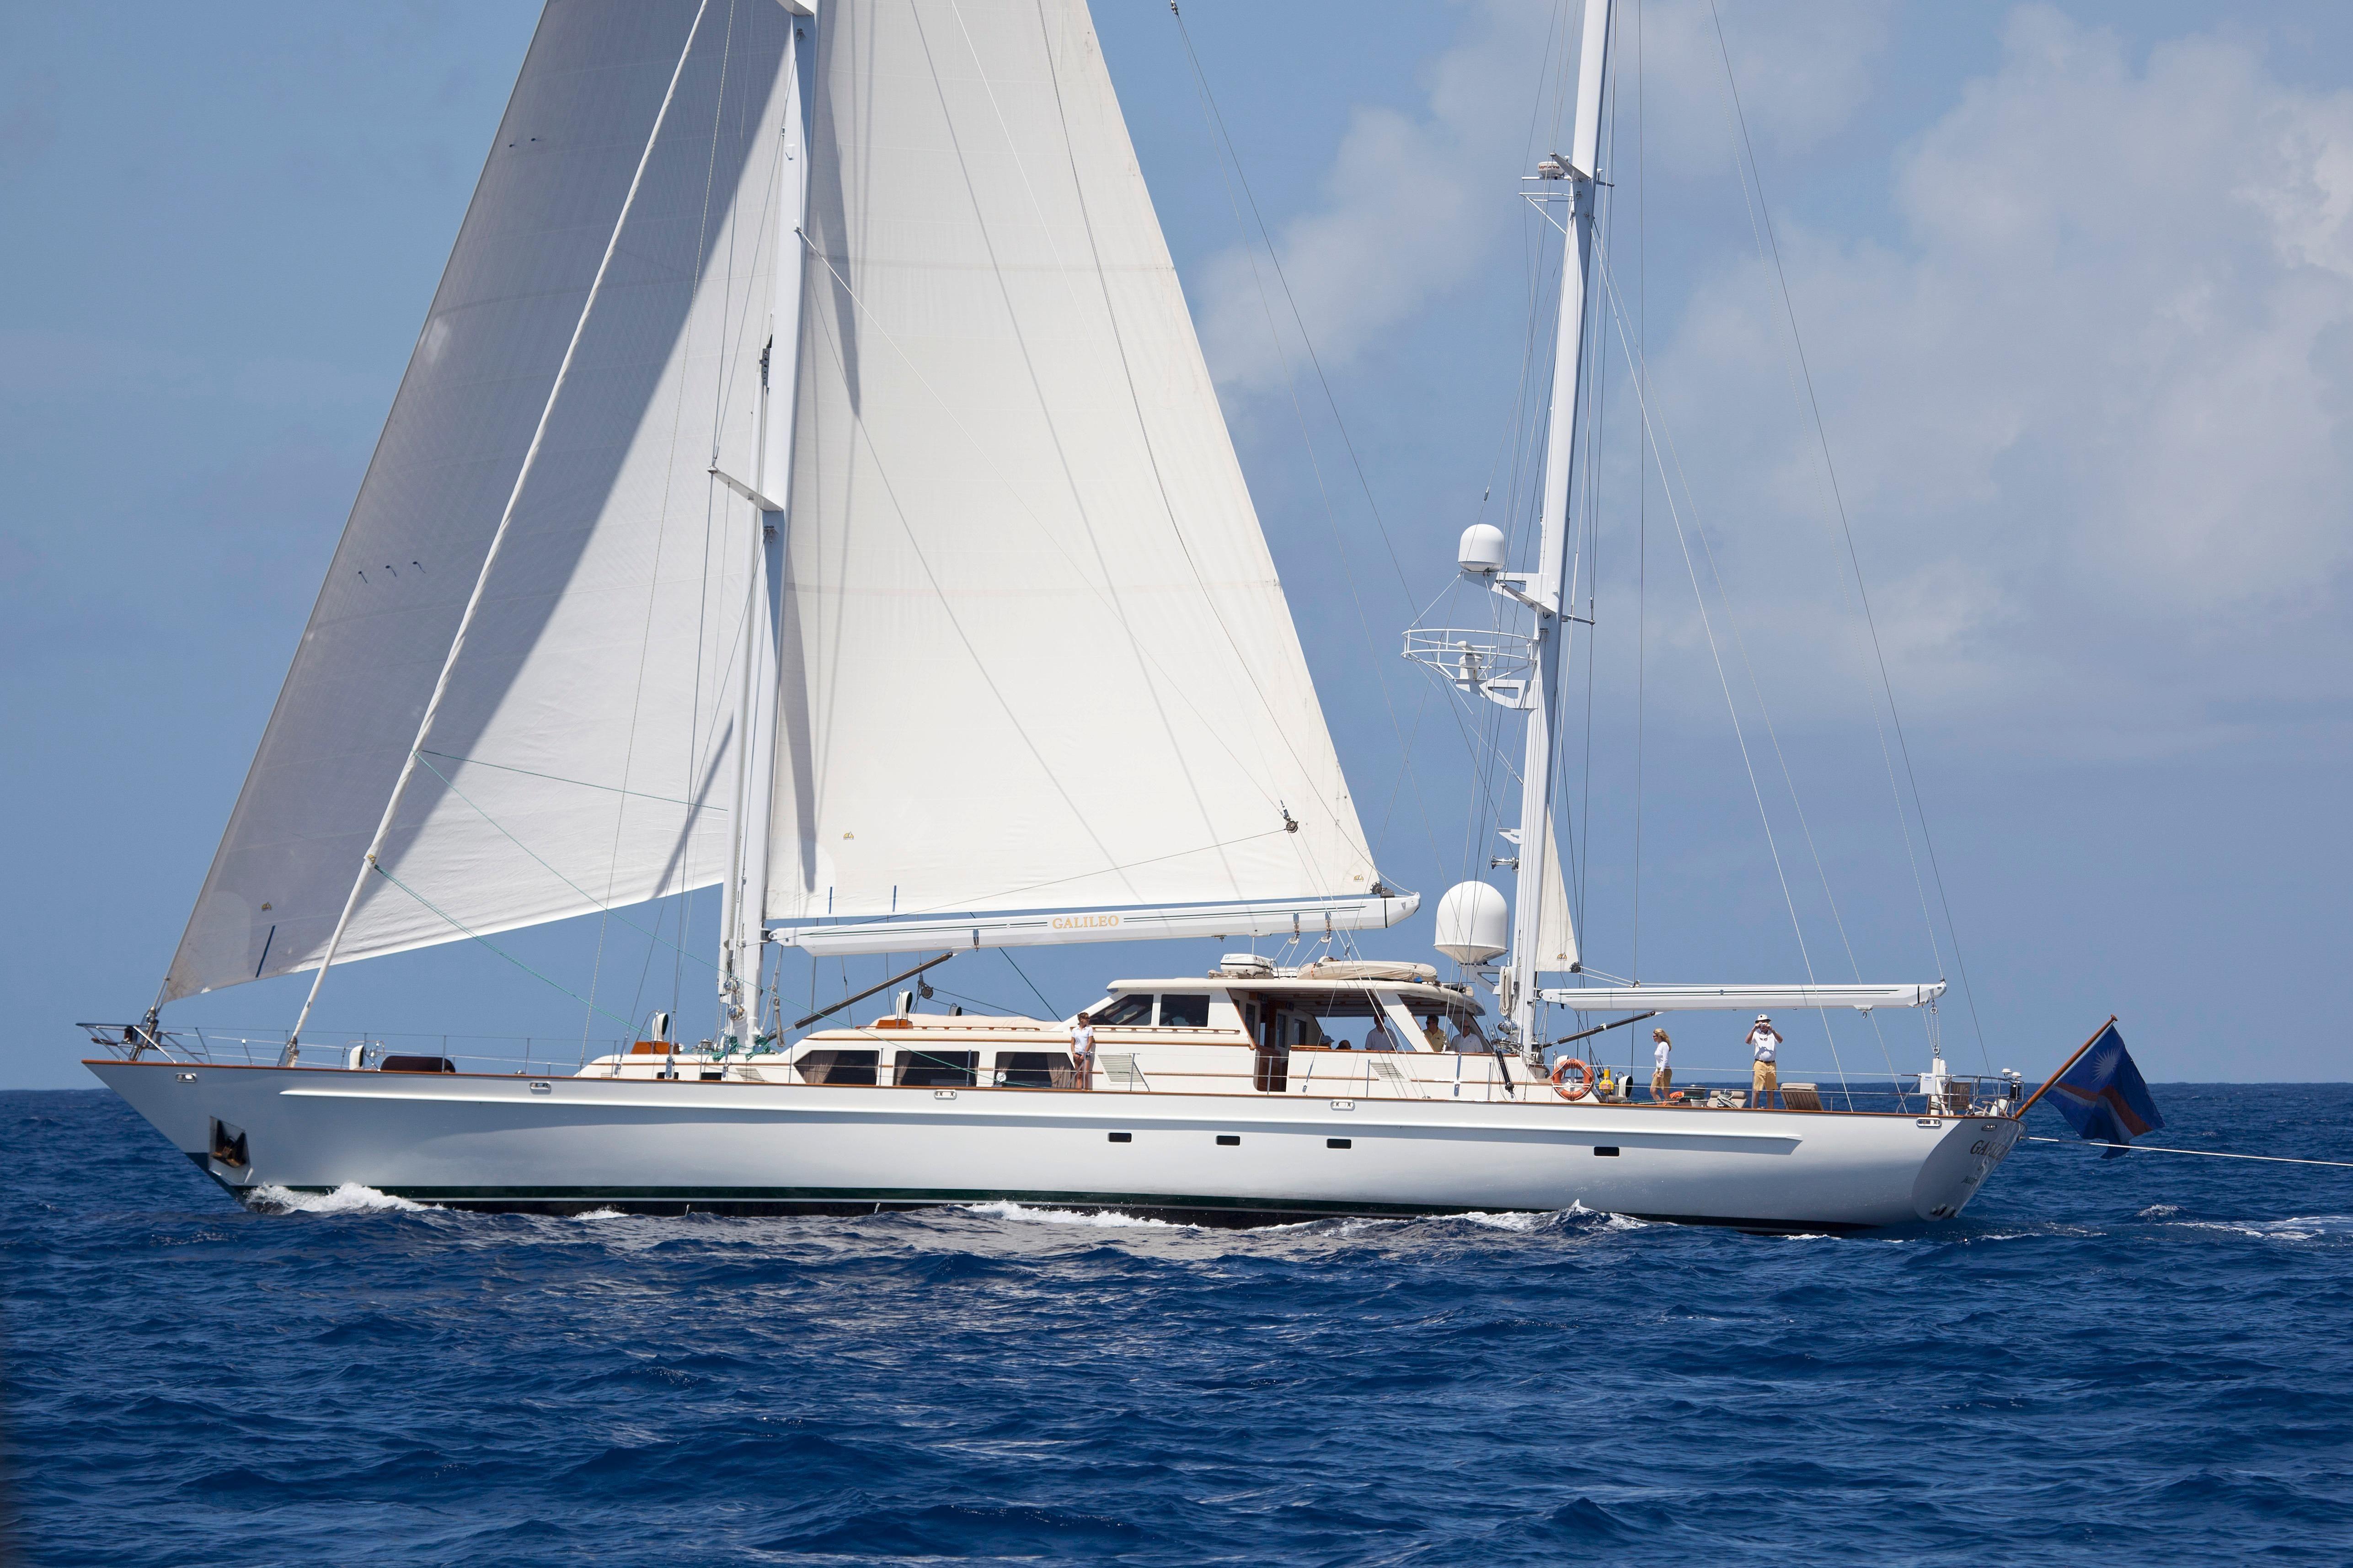 1989 Palmer Johnson Custom Offshore Ketch Sail Boat For